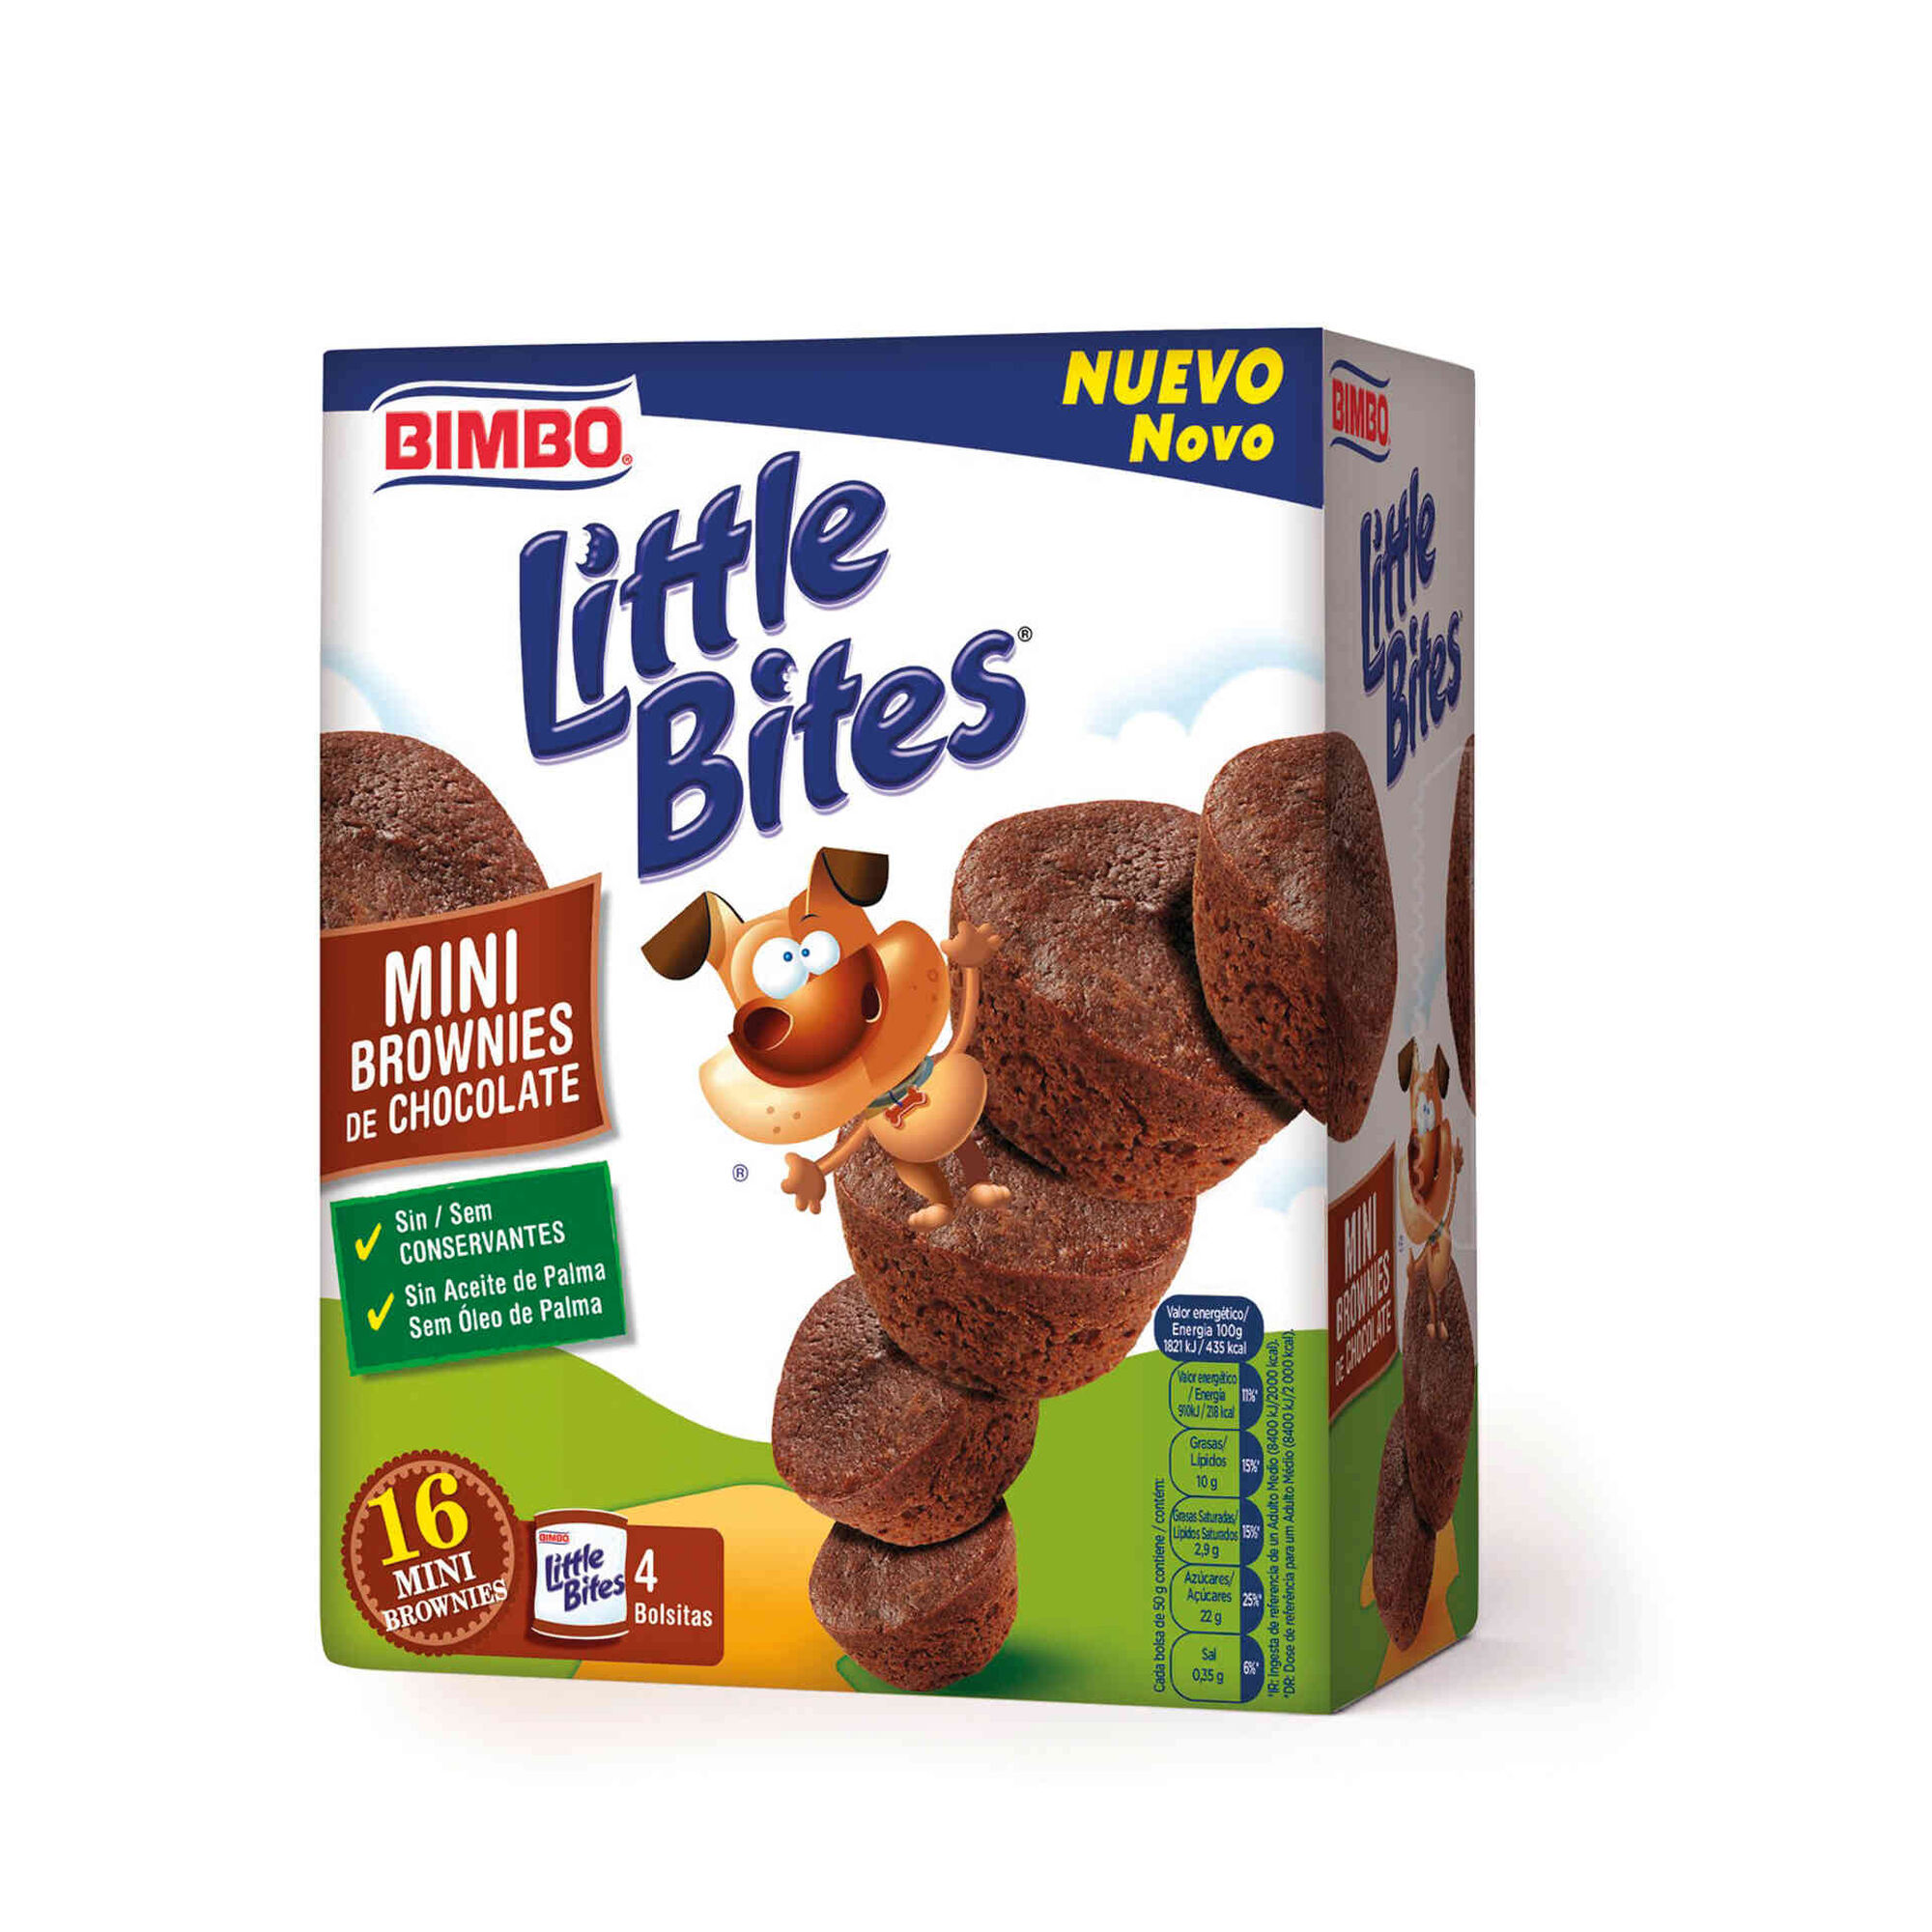 Mini Brownies de Chocolate Little Bites